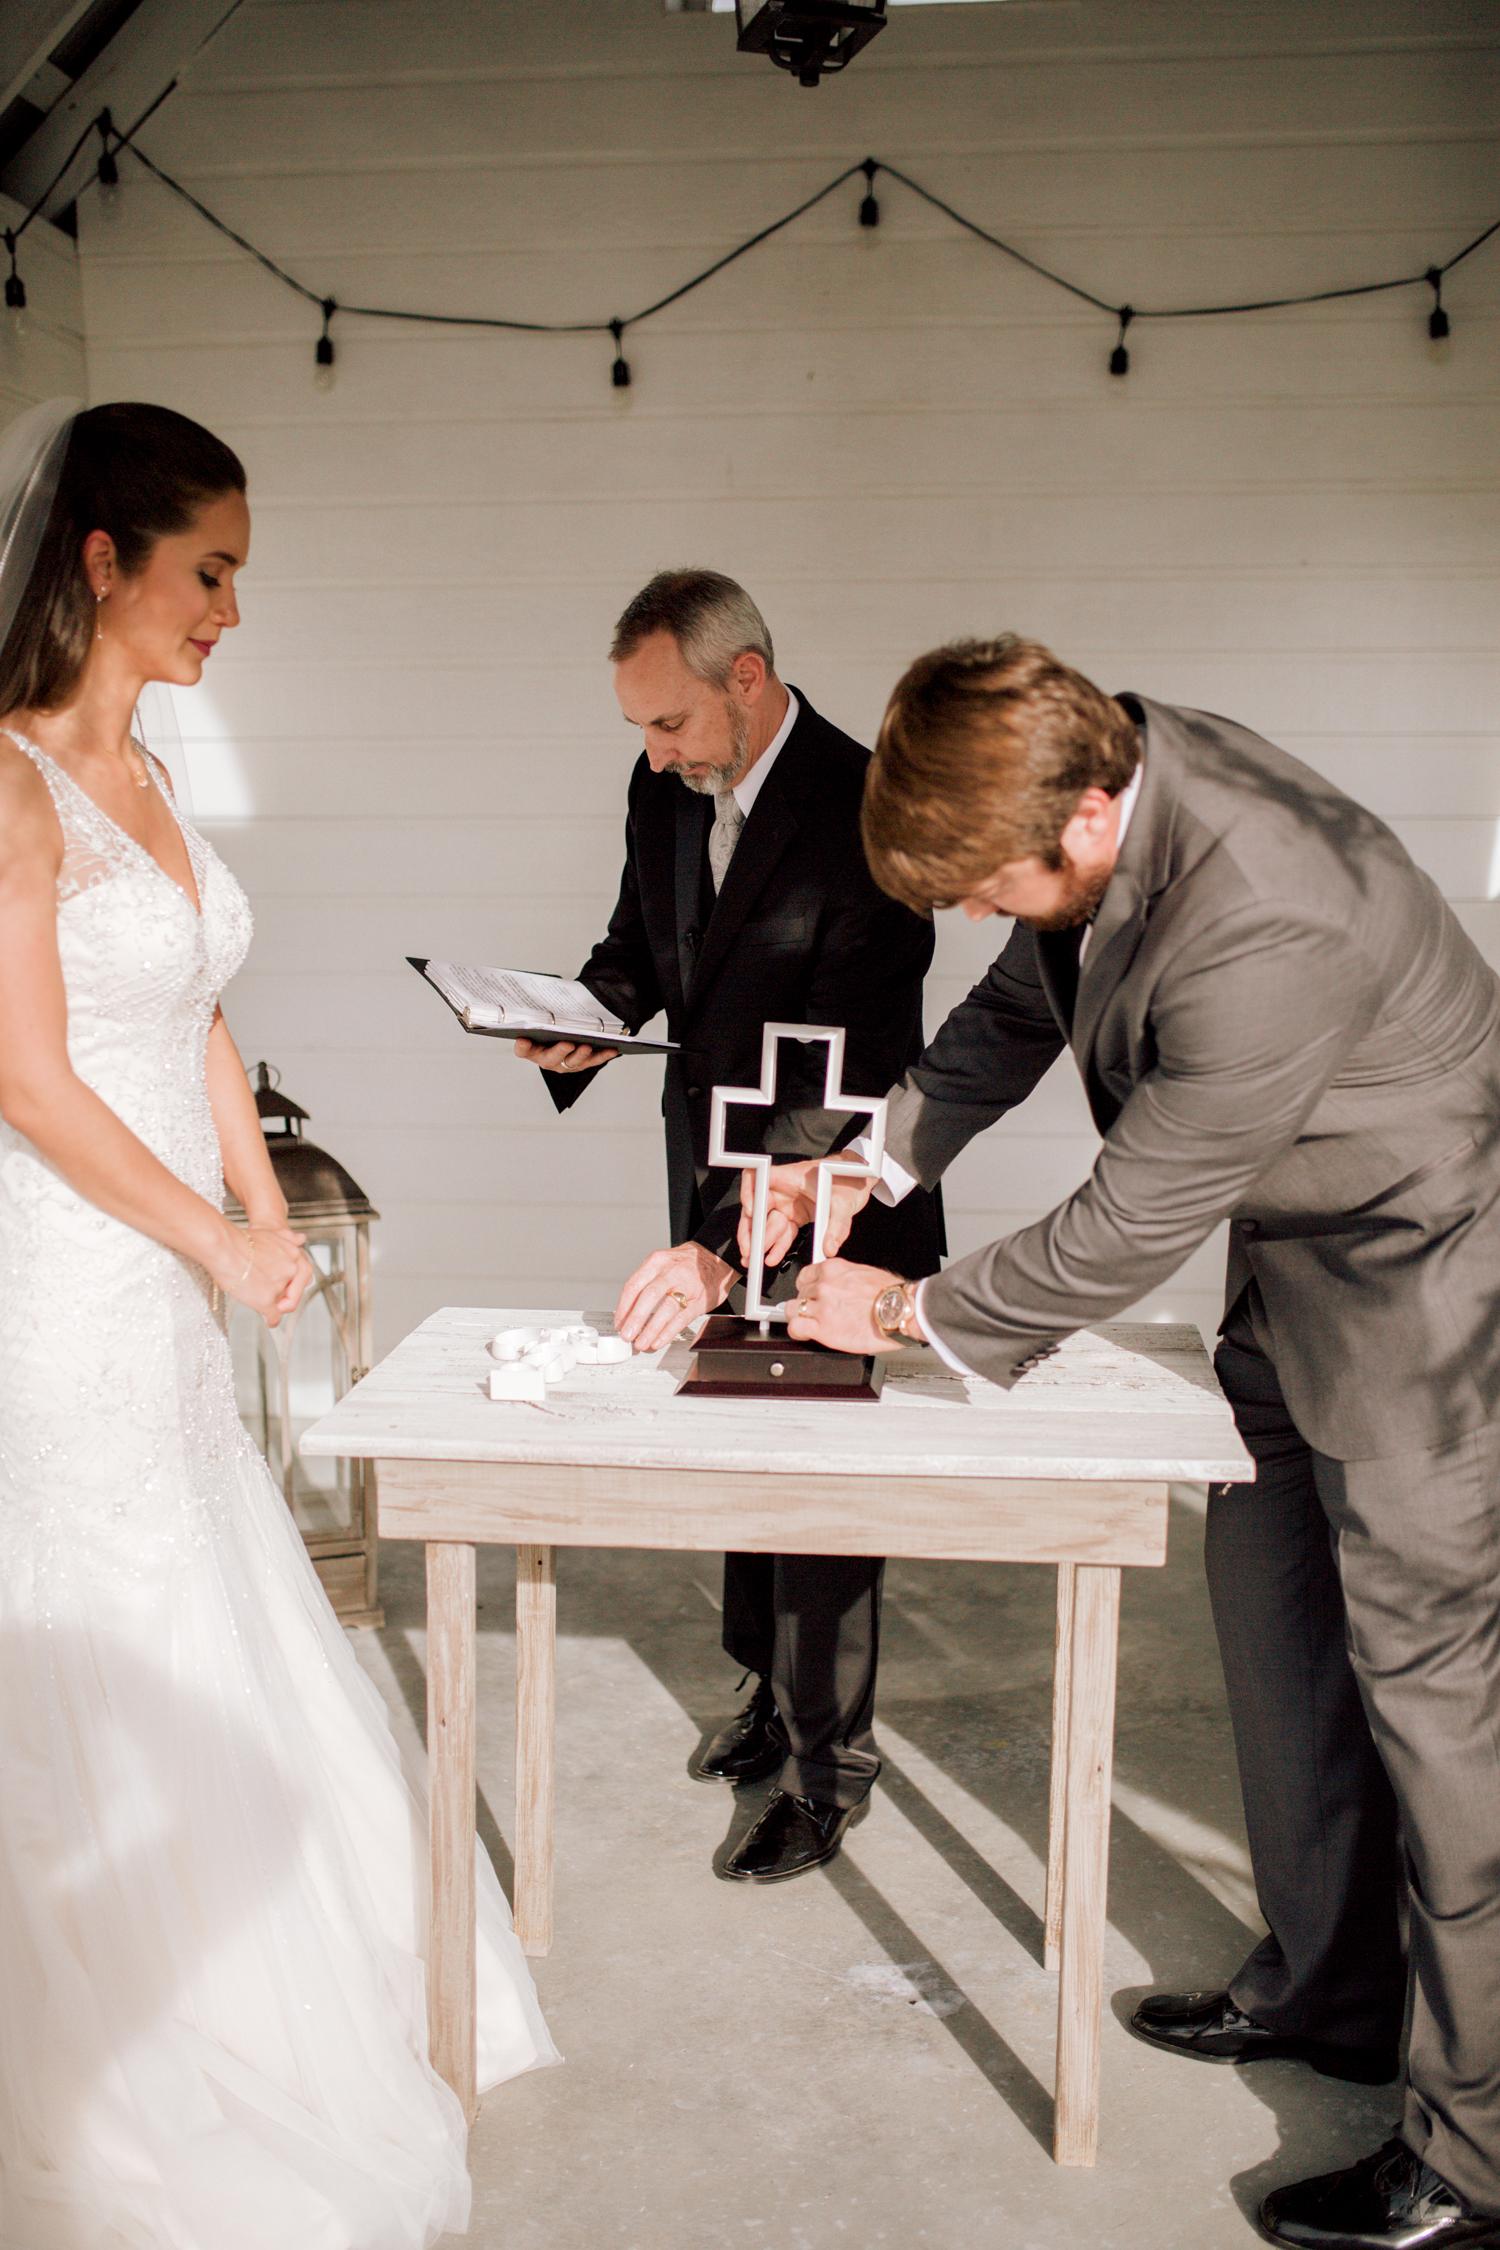 alaa-marzouk-photography-rgvweddingphotographer-rio-grande-valley-mathis-wedding-bridal-bride-san-antonio-portrait-weddings-mcallen-102.jpg